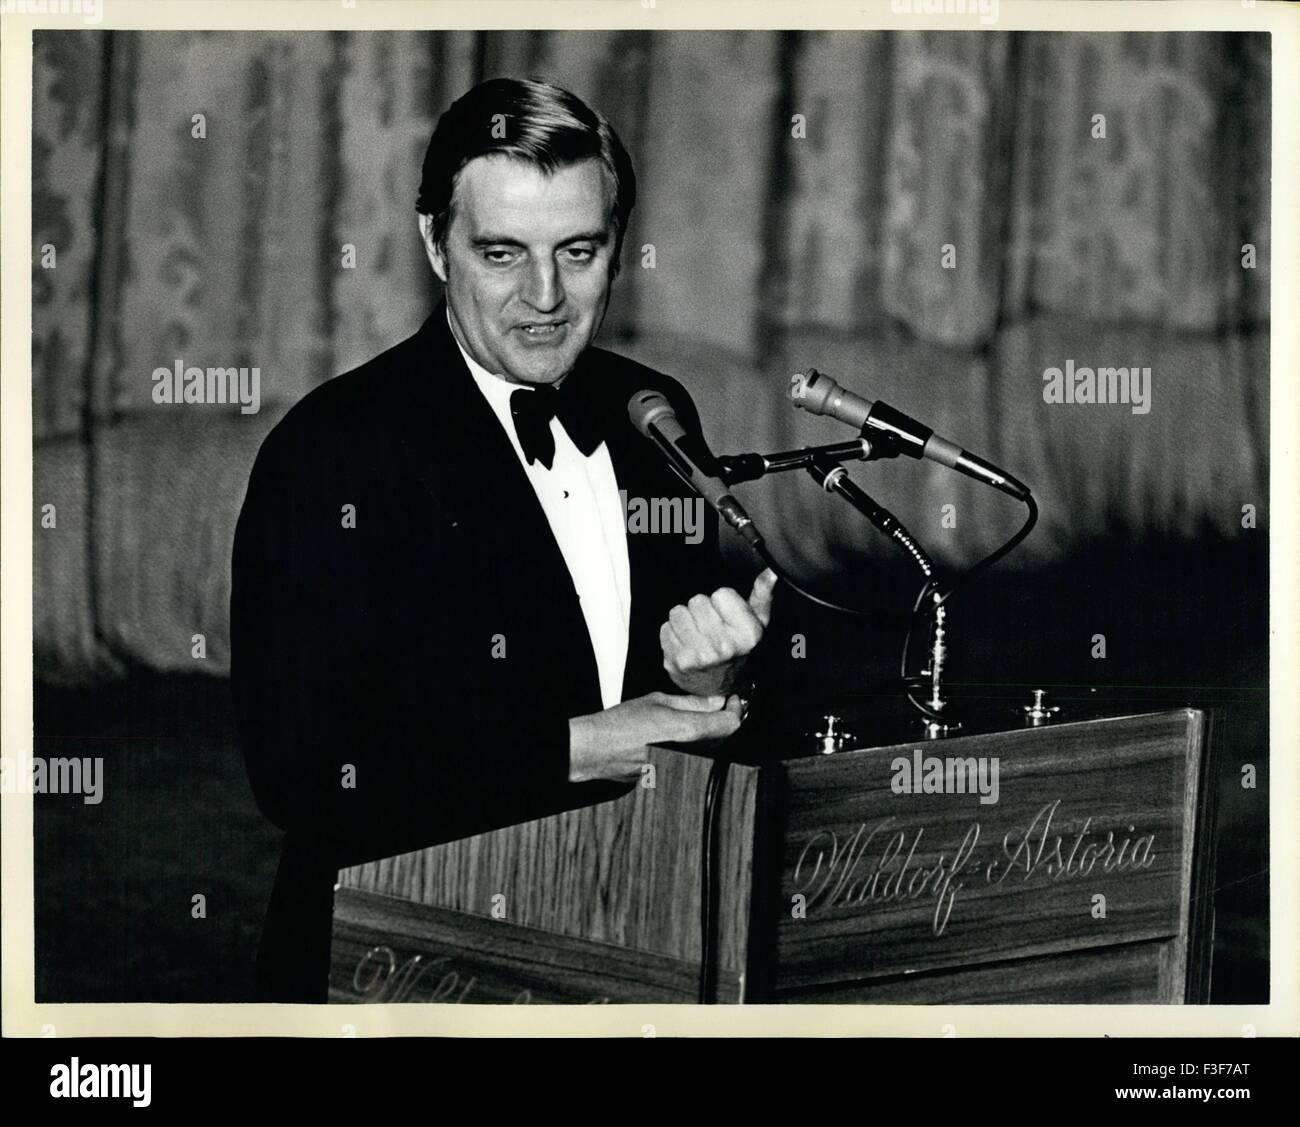 1978 - Tribute to Hubert Humphrey dinner, Waldorf Ast 626/78-benefiting the Hubert H. Humphrey Institute of Public - Stock Image